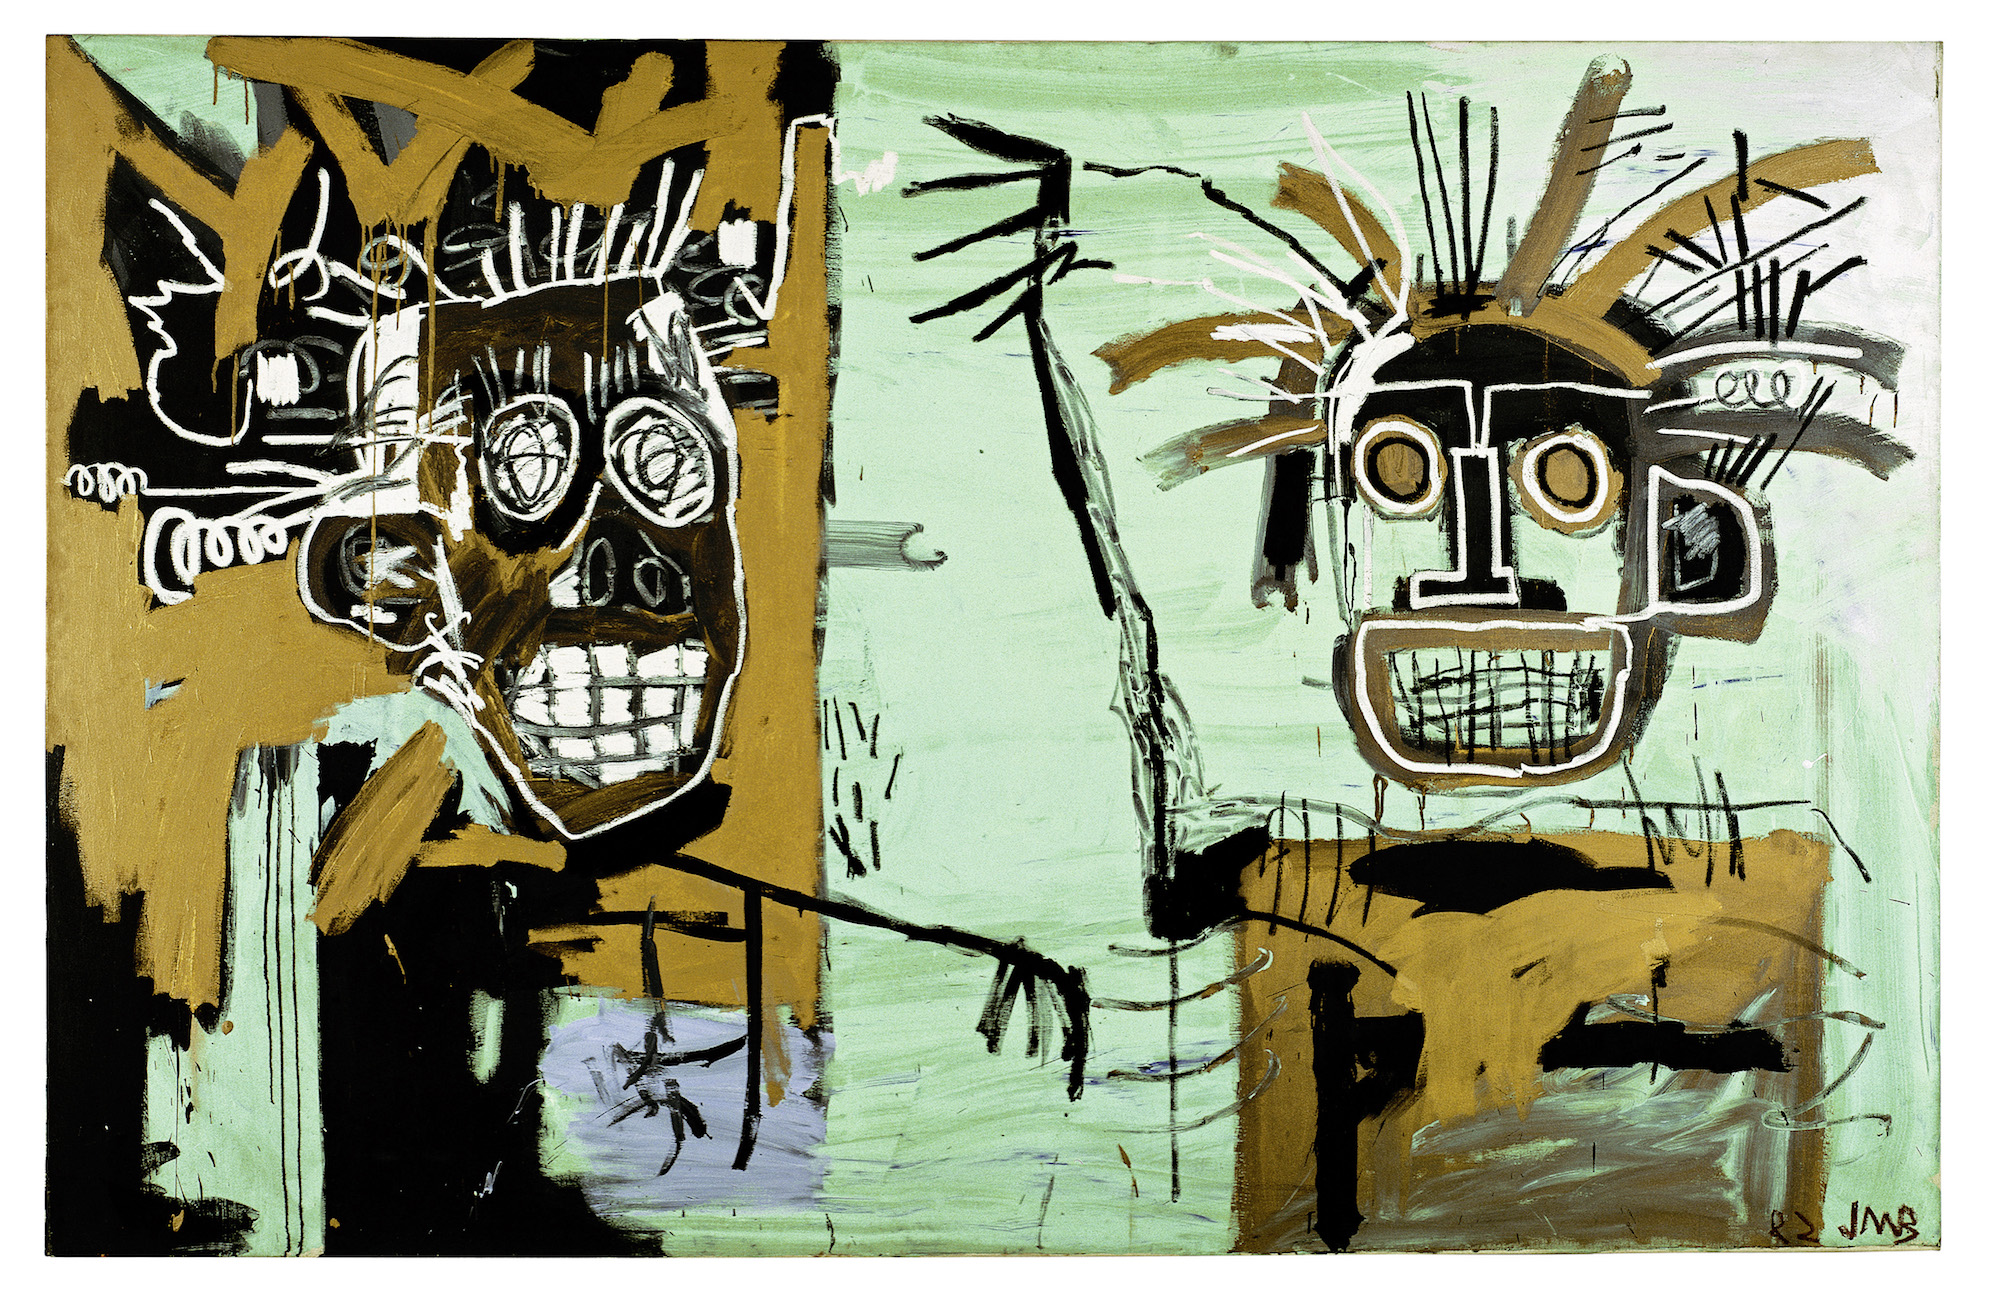 XL_Basquiat_01141_168-169.jpg